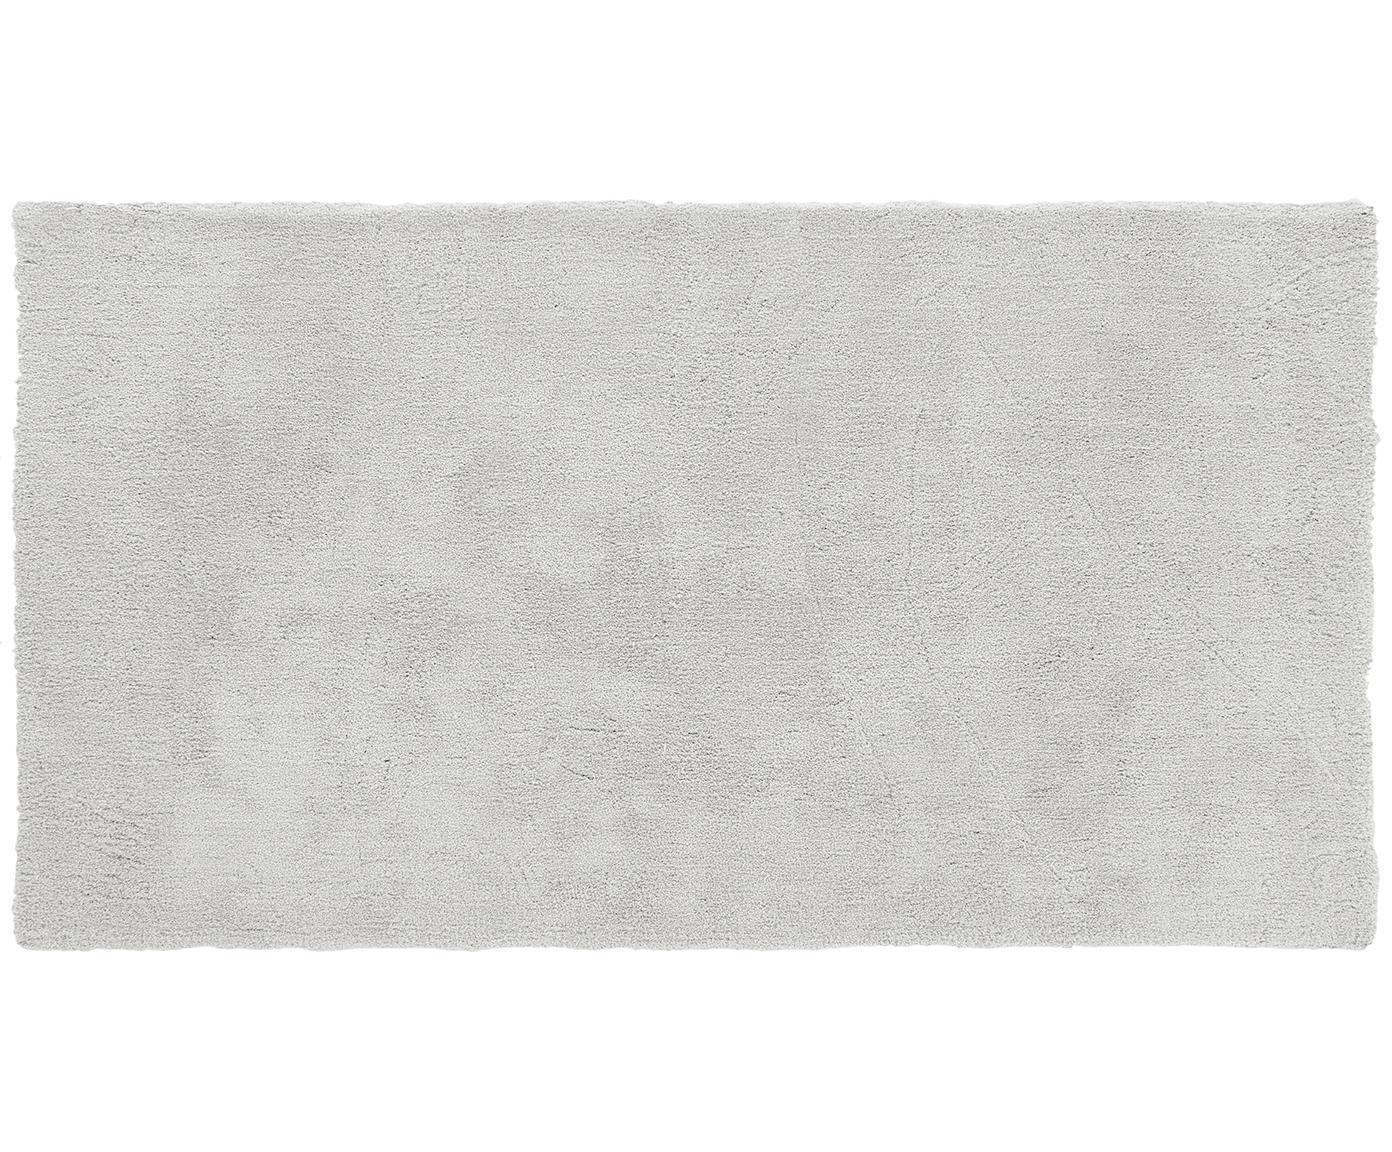 Alfombra de pelo largo Leighton, Parte superior: 100%poliéster (microfibr, Reverso: 100%poliéster, Gris claro, An 80 x L 150 cm (Tamaño XS)